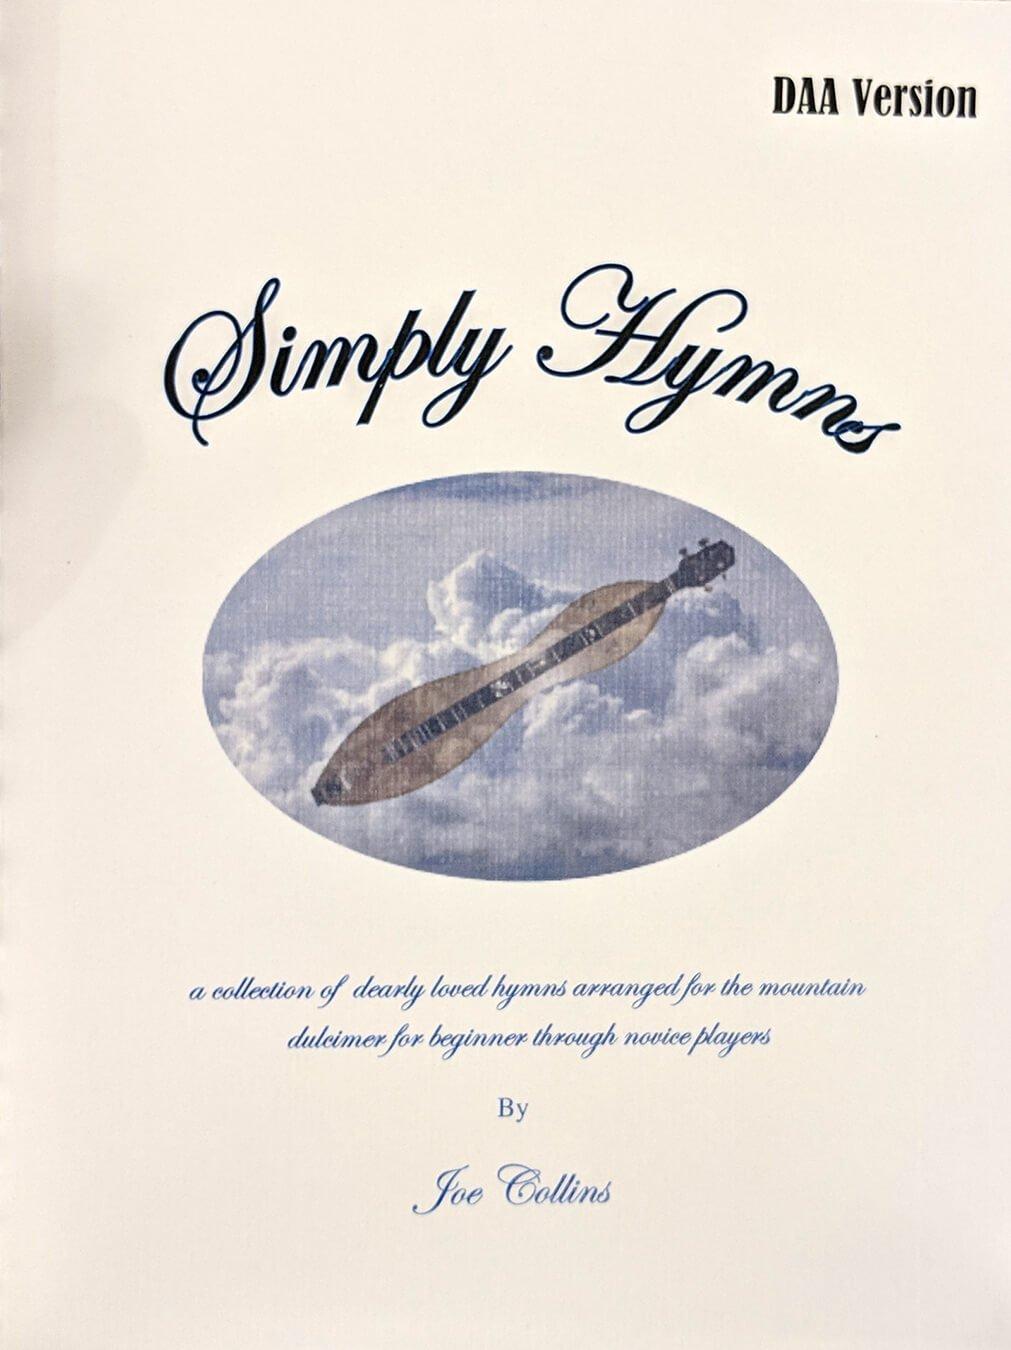 Joe Collins - Simply Hymns, DAA Version